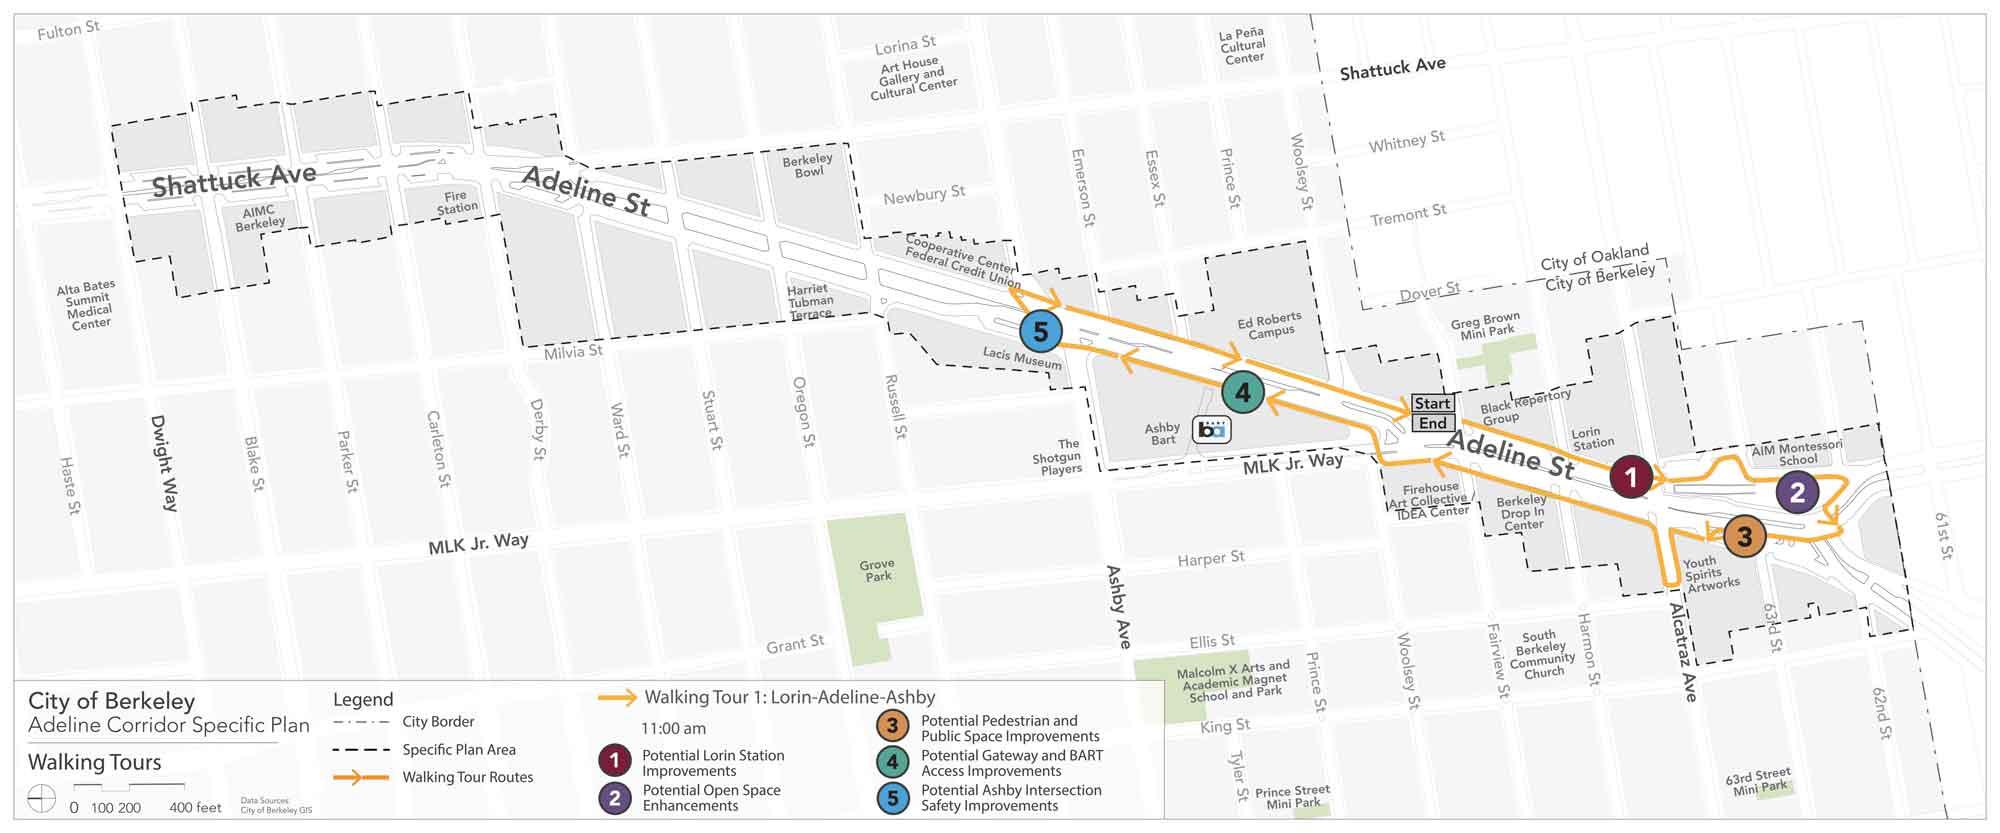 Adeline Corridor Plan - walking tour route 1 Survey